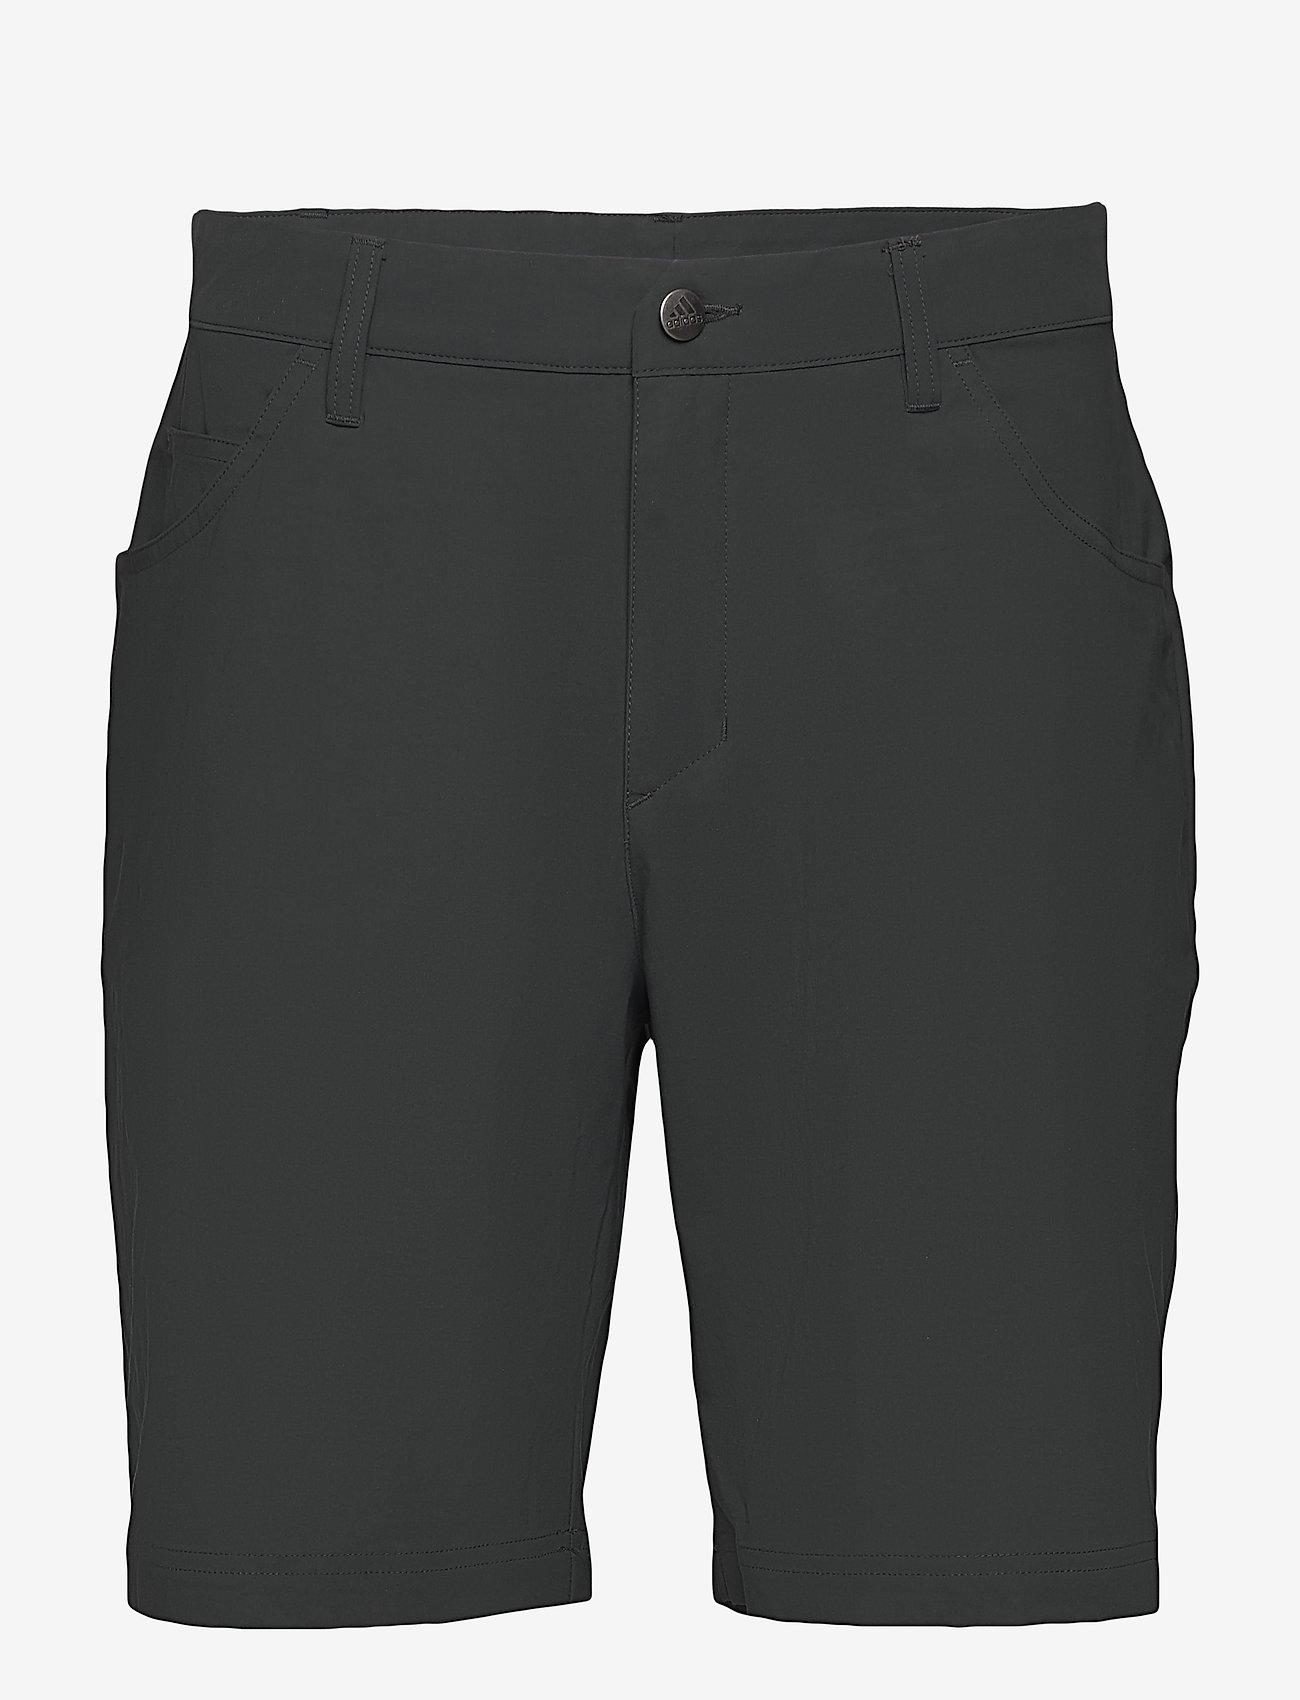 adidas Golf - ADIX 5PKT SHORT - szorty golfowe - carbon - 1